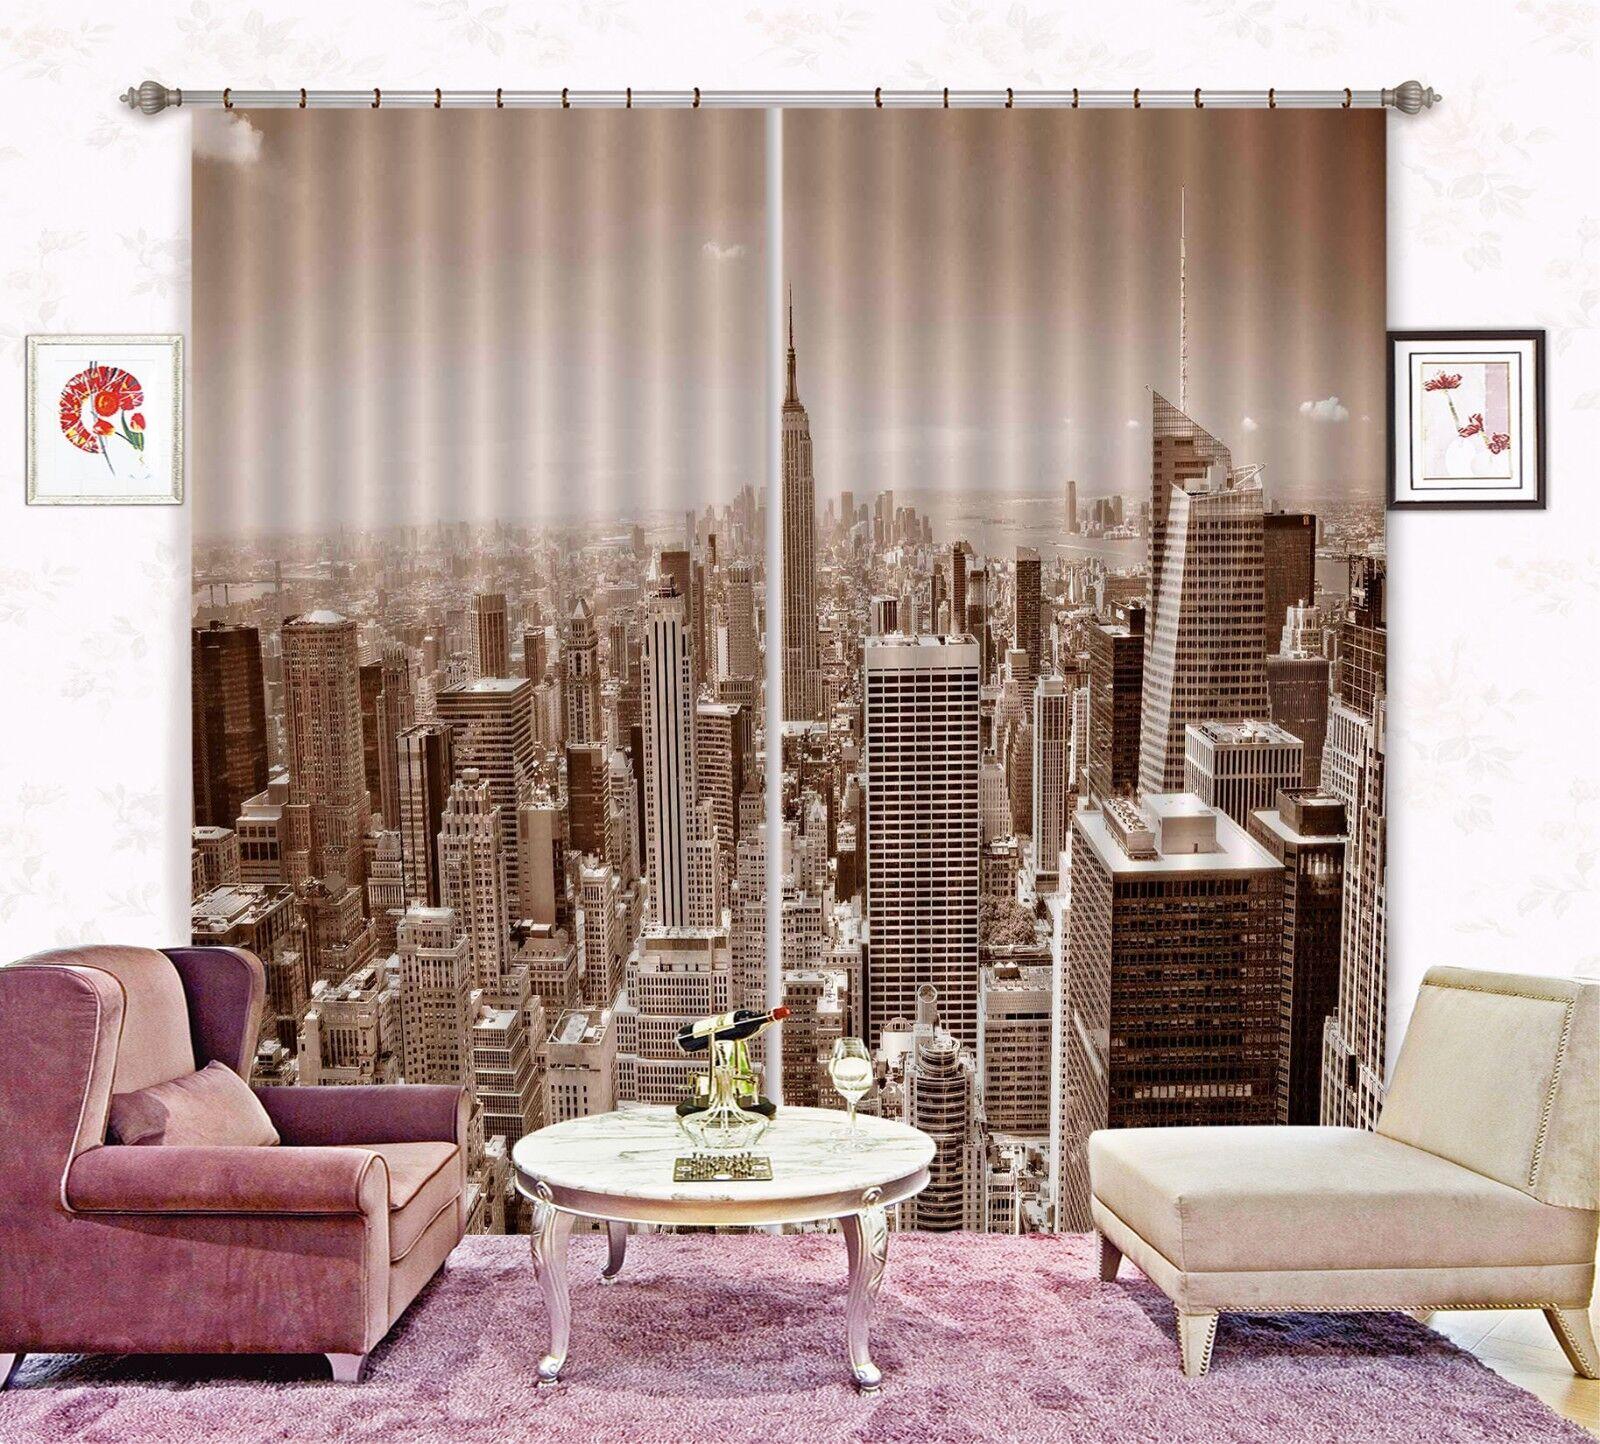 3d edificio Empire State 668 bloqueo foto cortina cortina de impresión sustancia cortinas de ventana